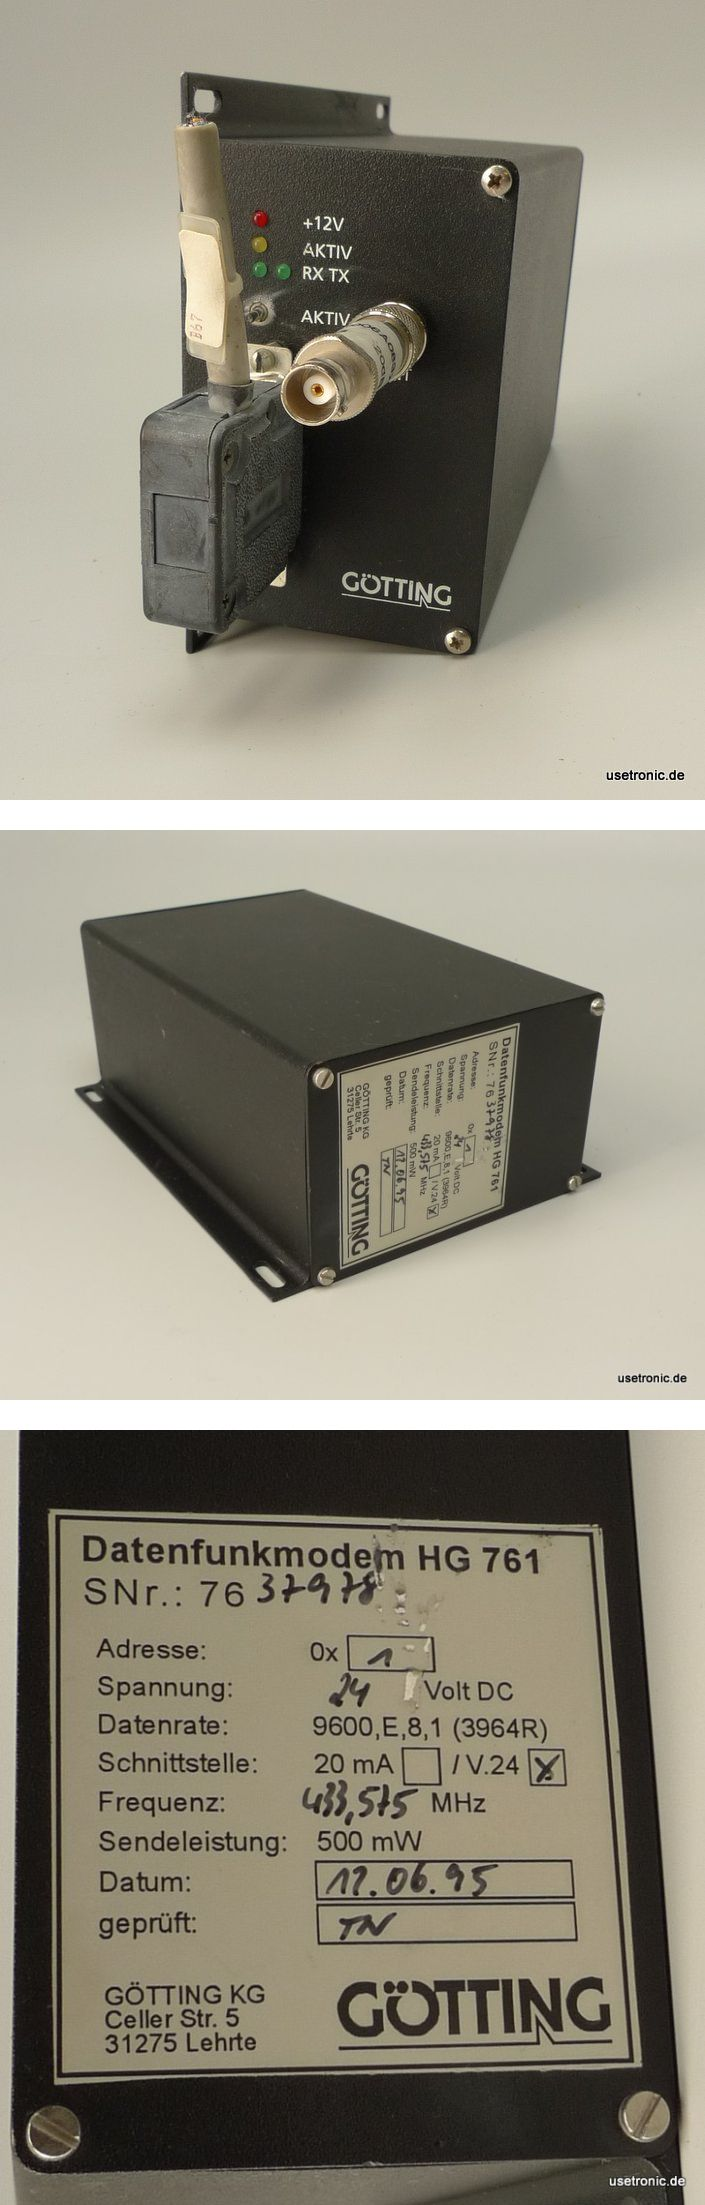 Götting Datenfunkmodem HG761